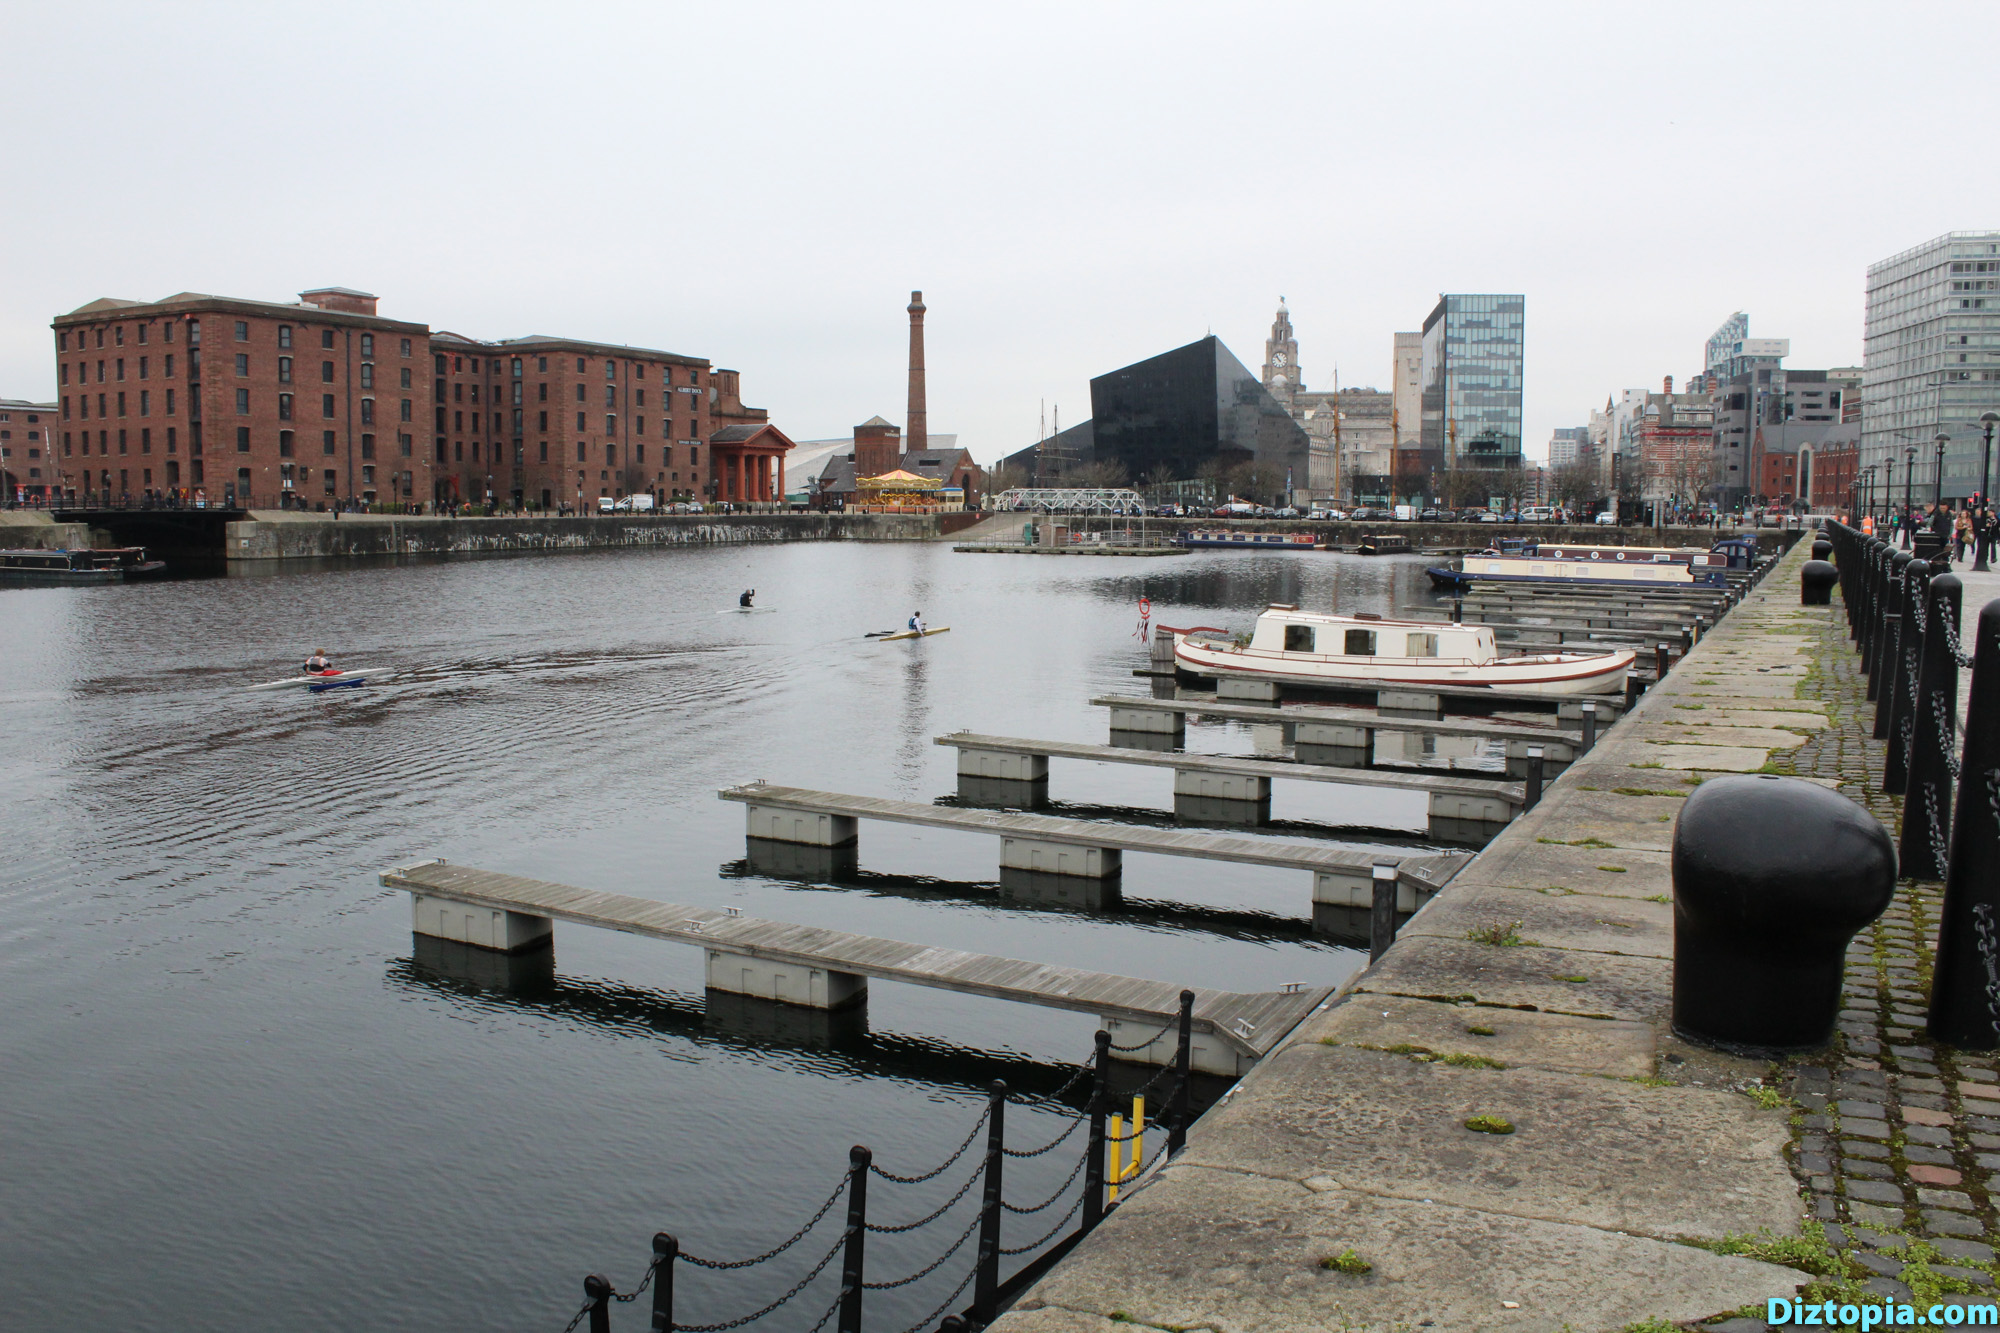 Liverpool-City-UK-Diztopia-Dizma-Dahl-Photography-2017-02-Albert-Dock-Queens-Wapping-Salthouse-Canning-Coburg-Dukes